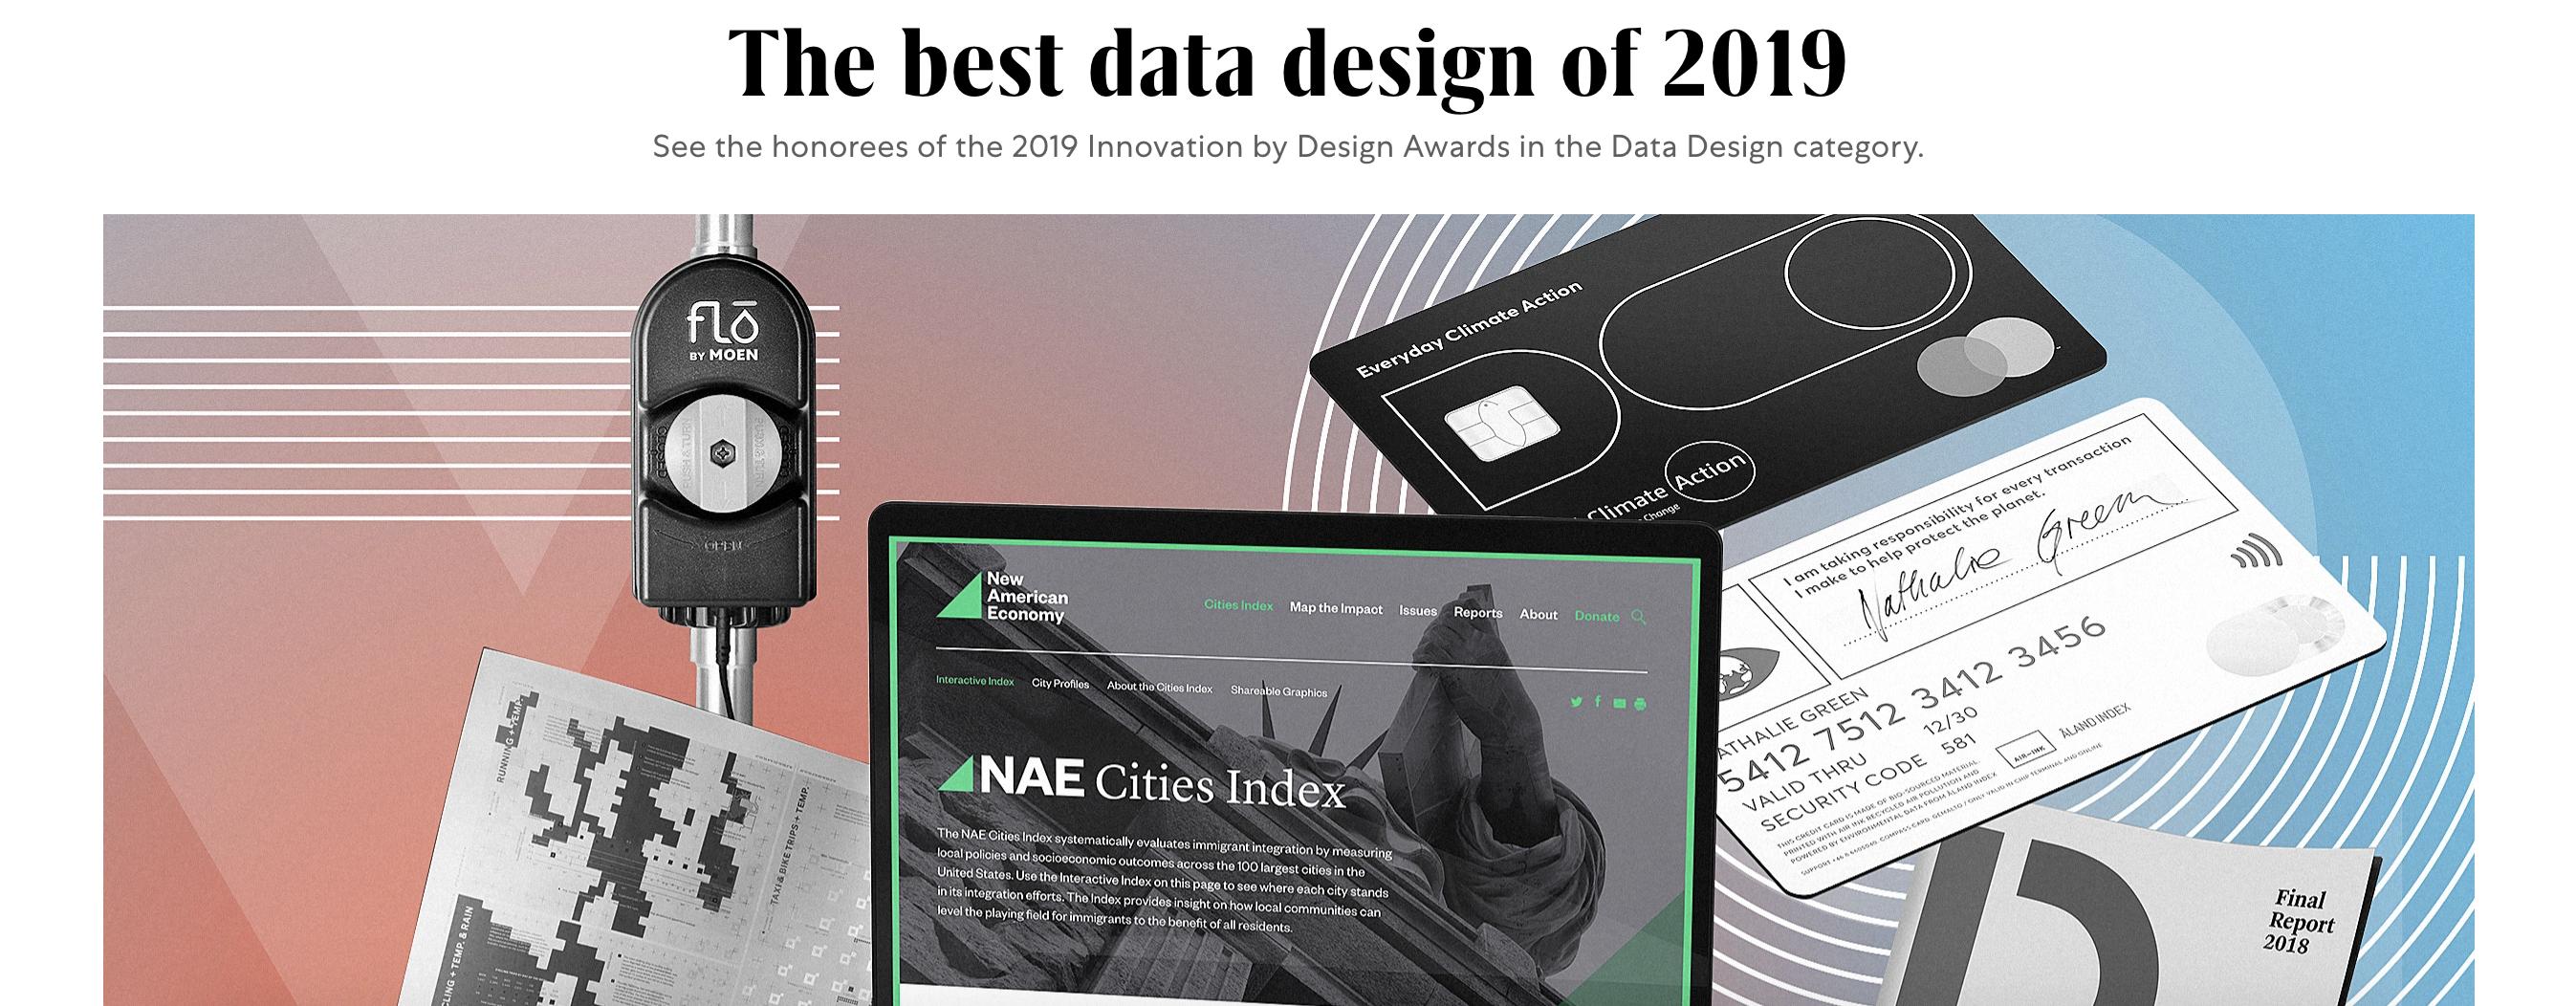 The best data design of 2019